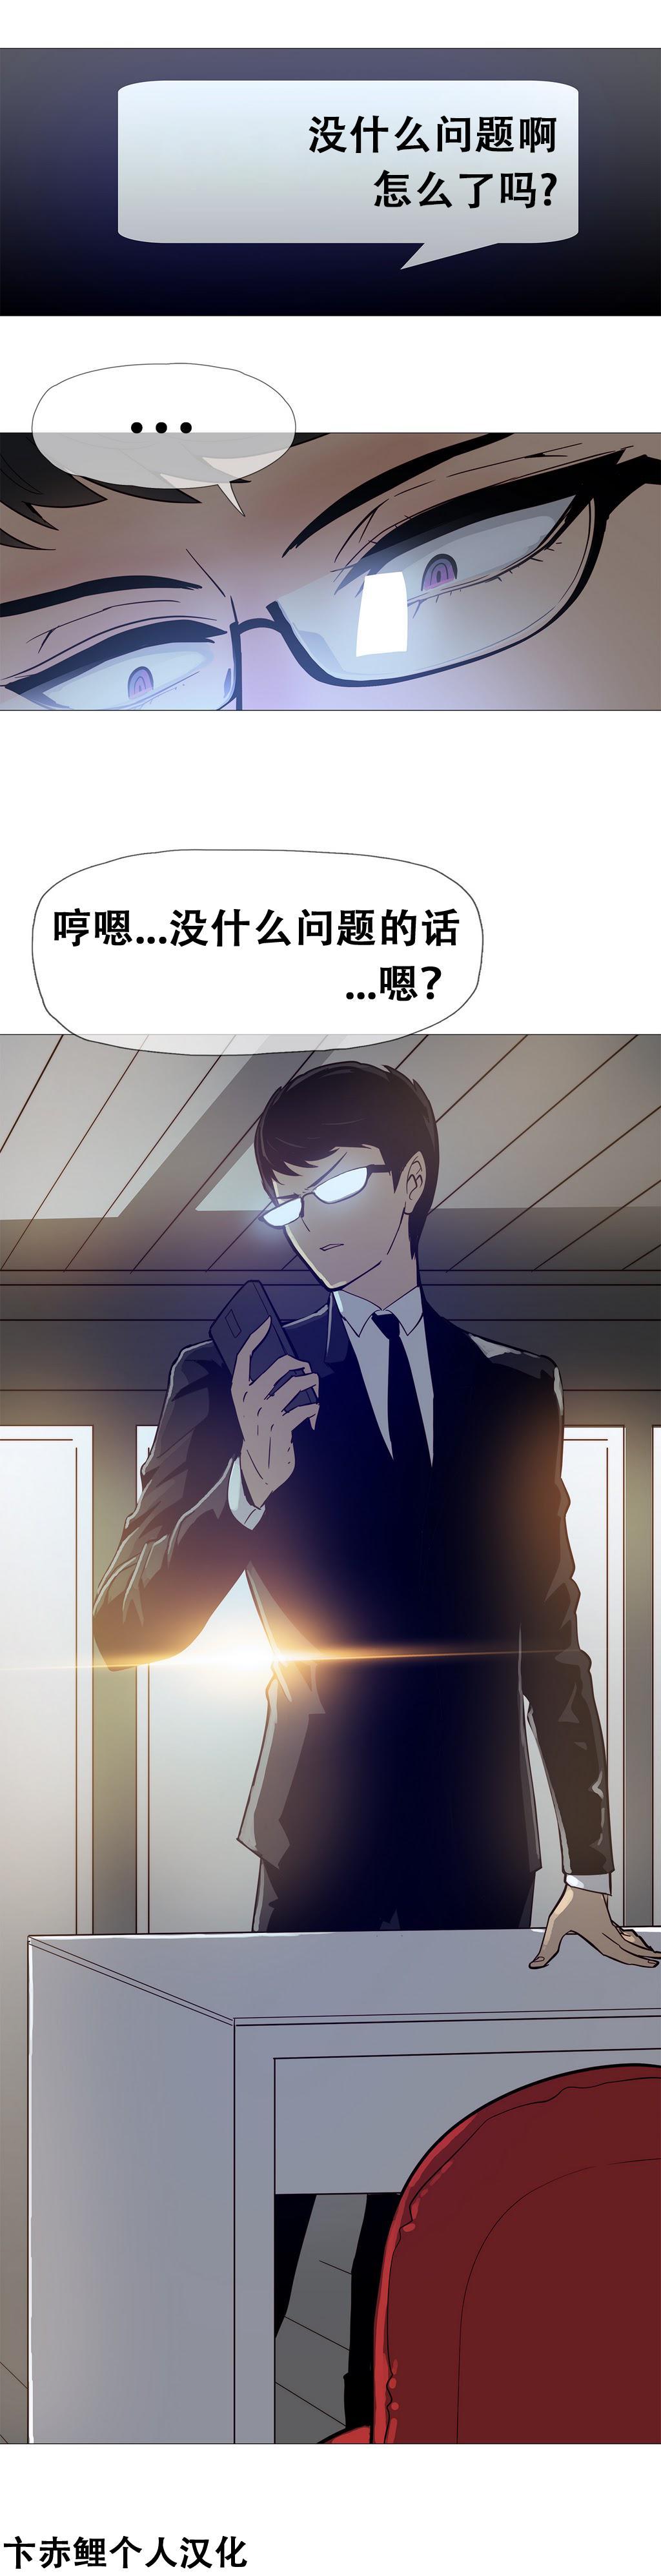 HouseHold Affairs 【卞赤鲤个人汉化】1~21话(持续更新中) 265